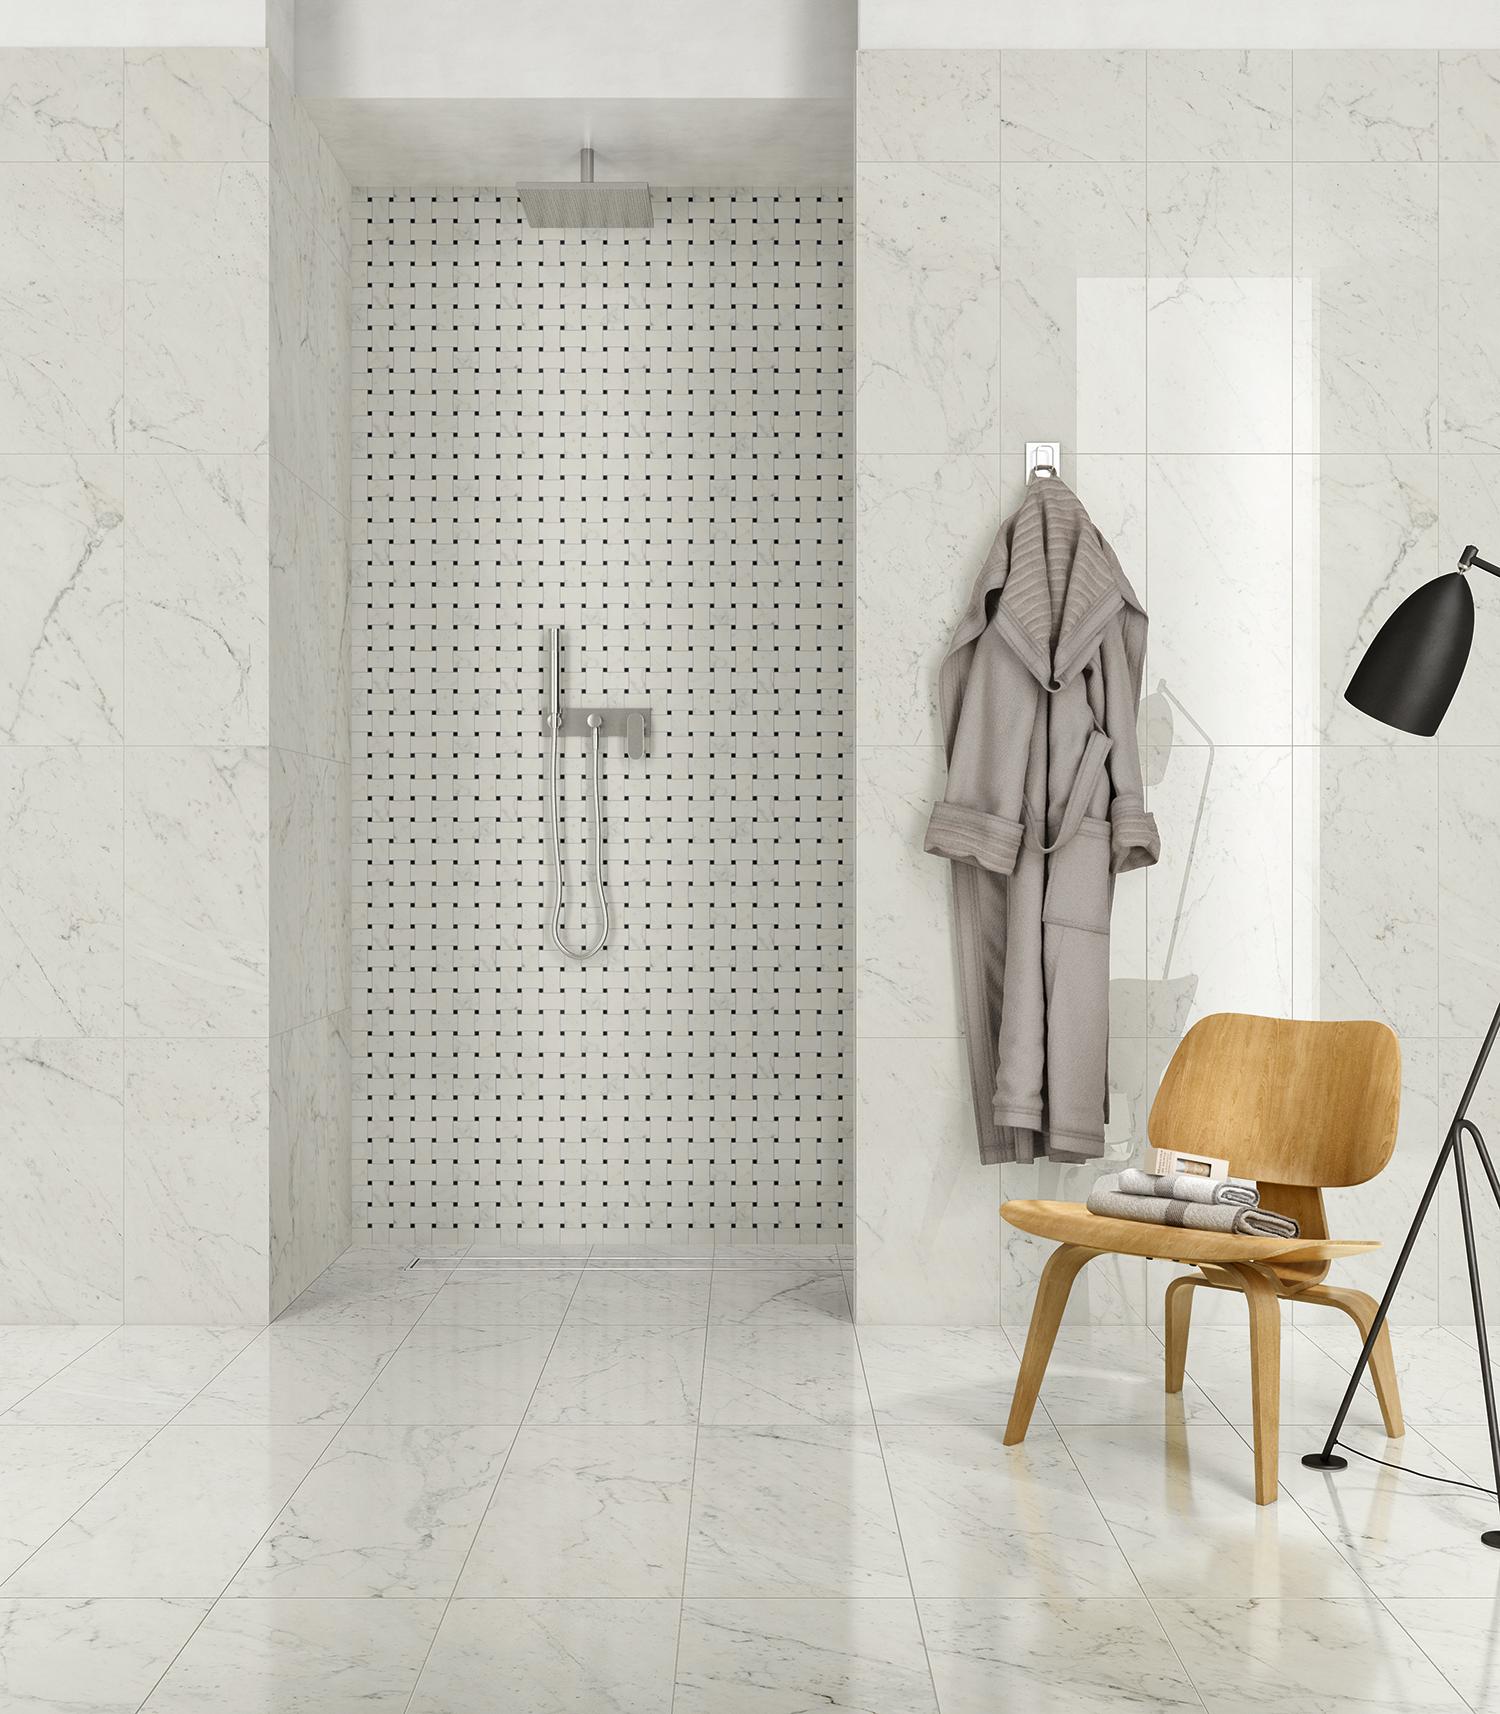 Classic Carrara Marble Bathrooms: Classic 2.0 Collection